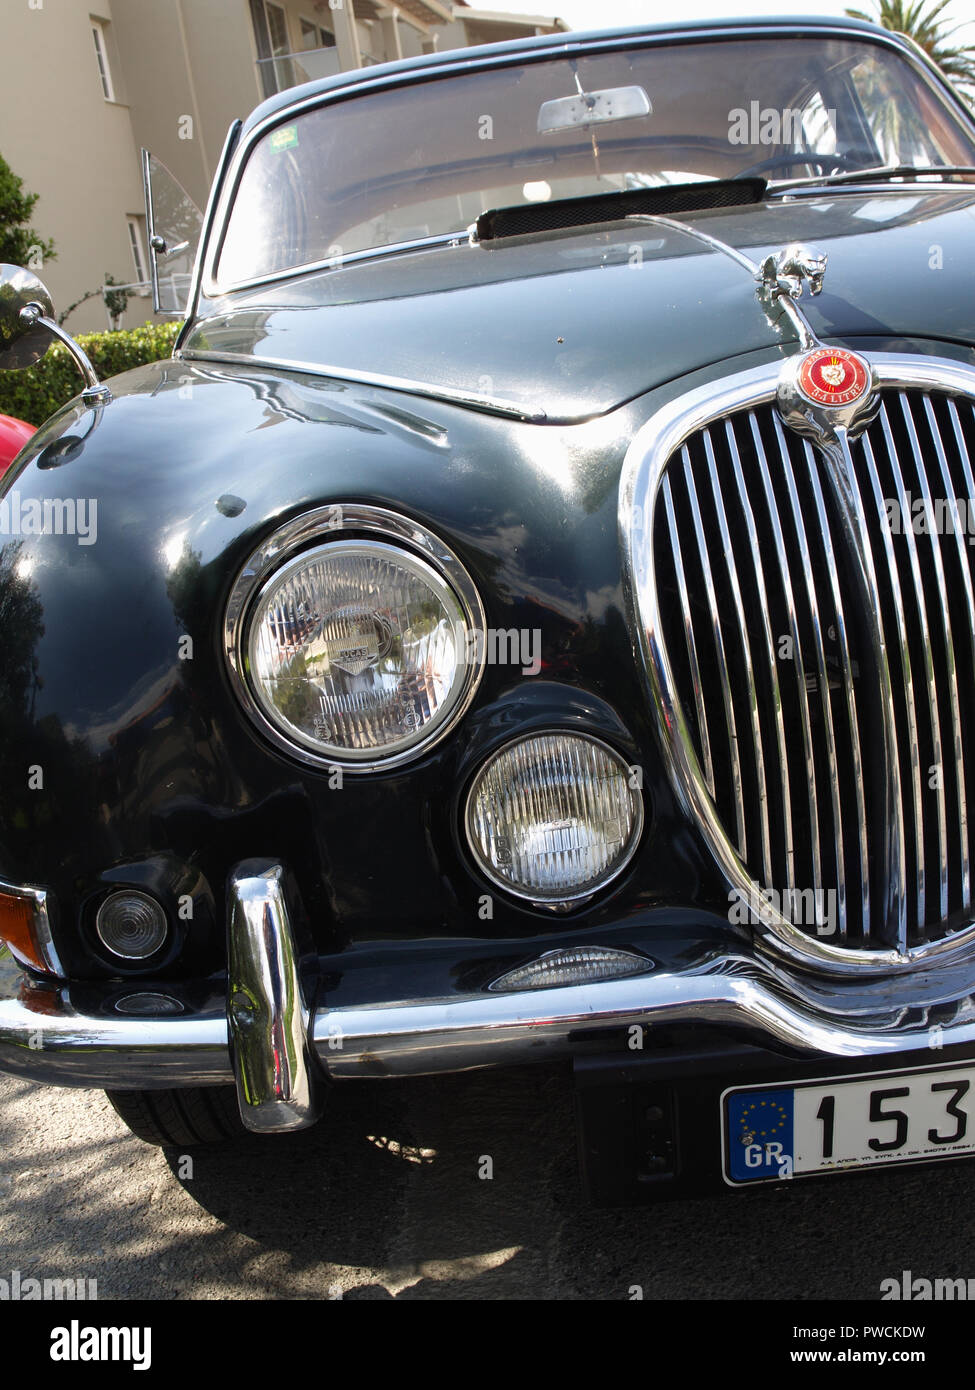 Vintage Jaguar Mark 2 on display at the 8th Hellenic Bulgarian LEKAM classic car rally at the Acharavi Park Hotel, Acharavi, Corfu, Greece - Stock Image